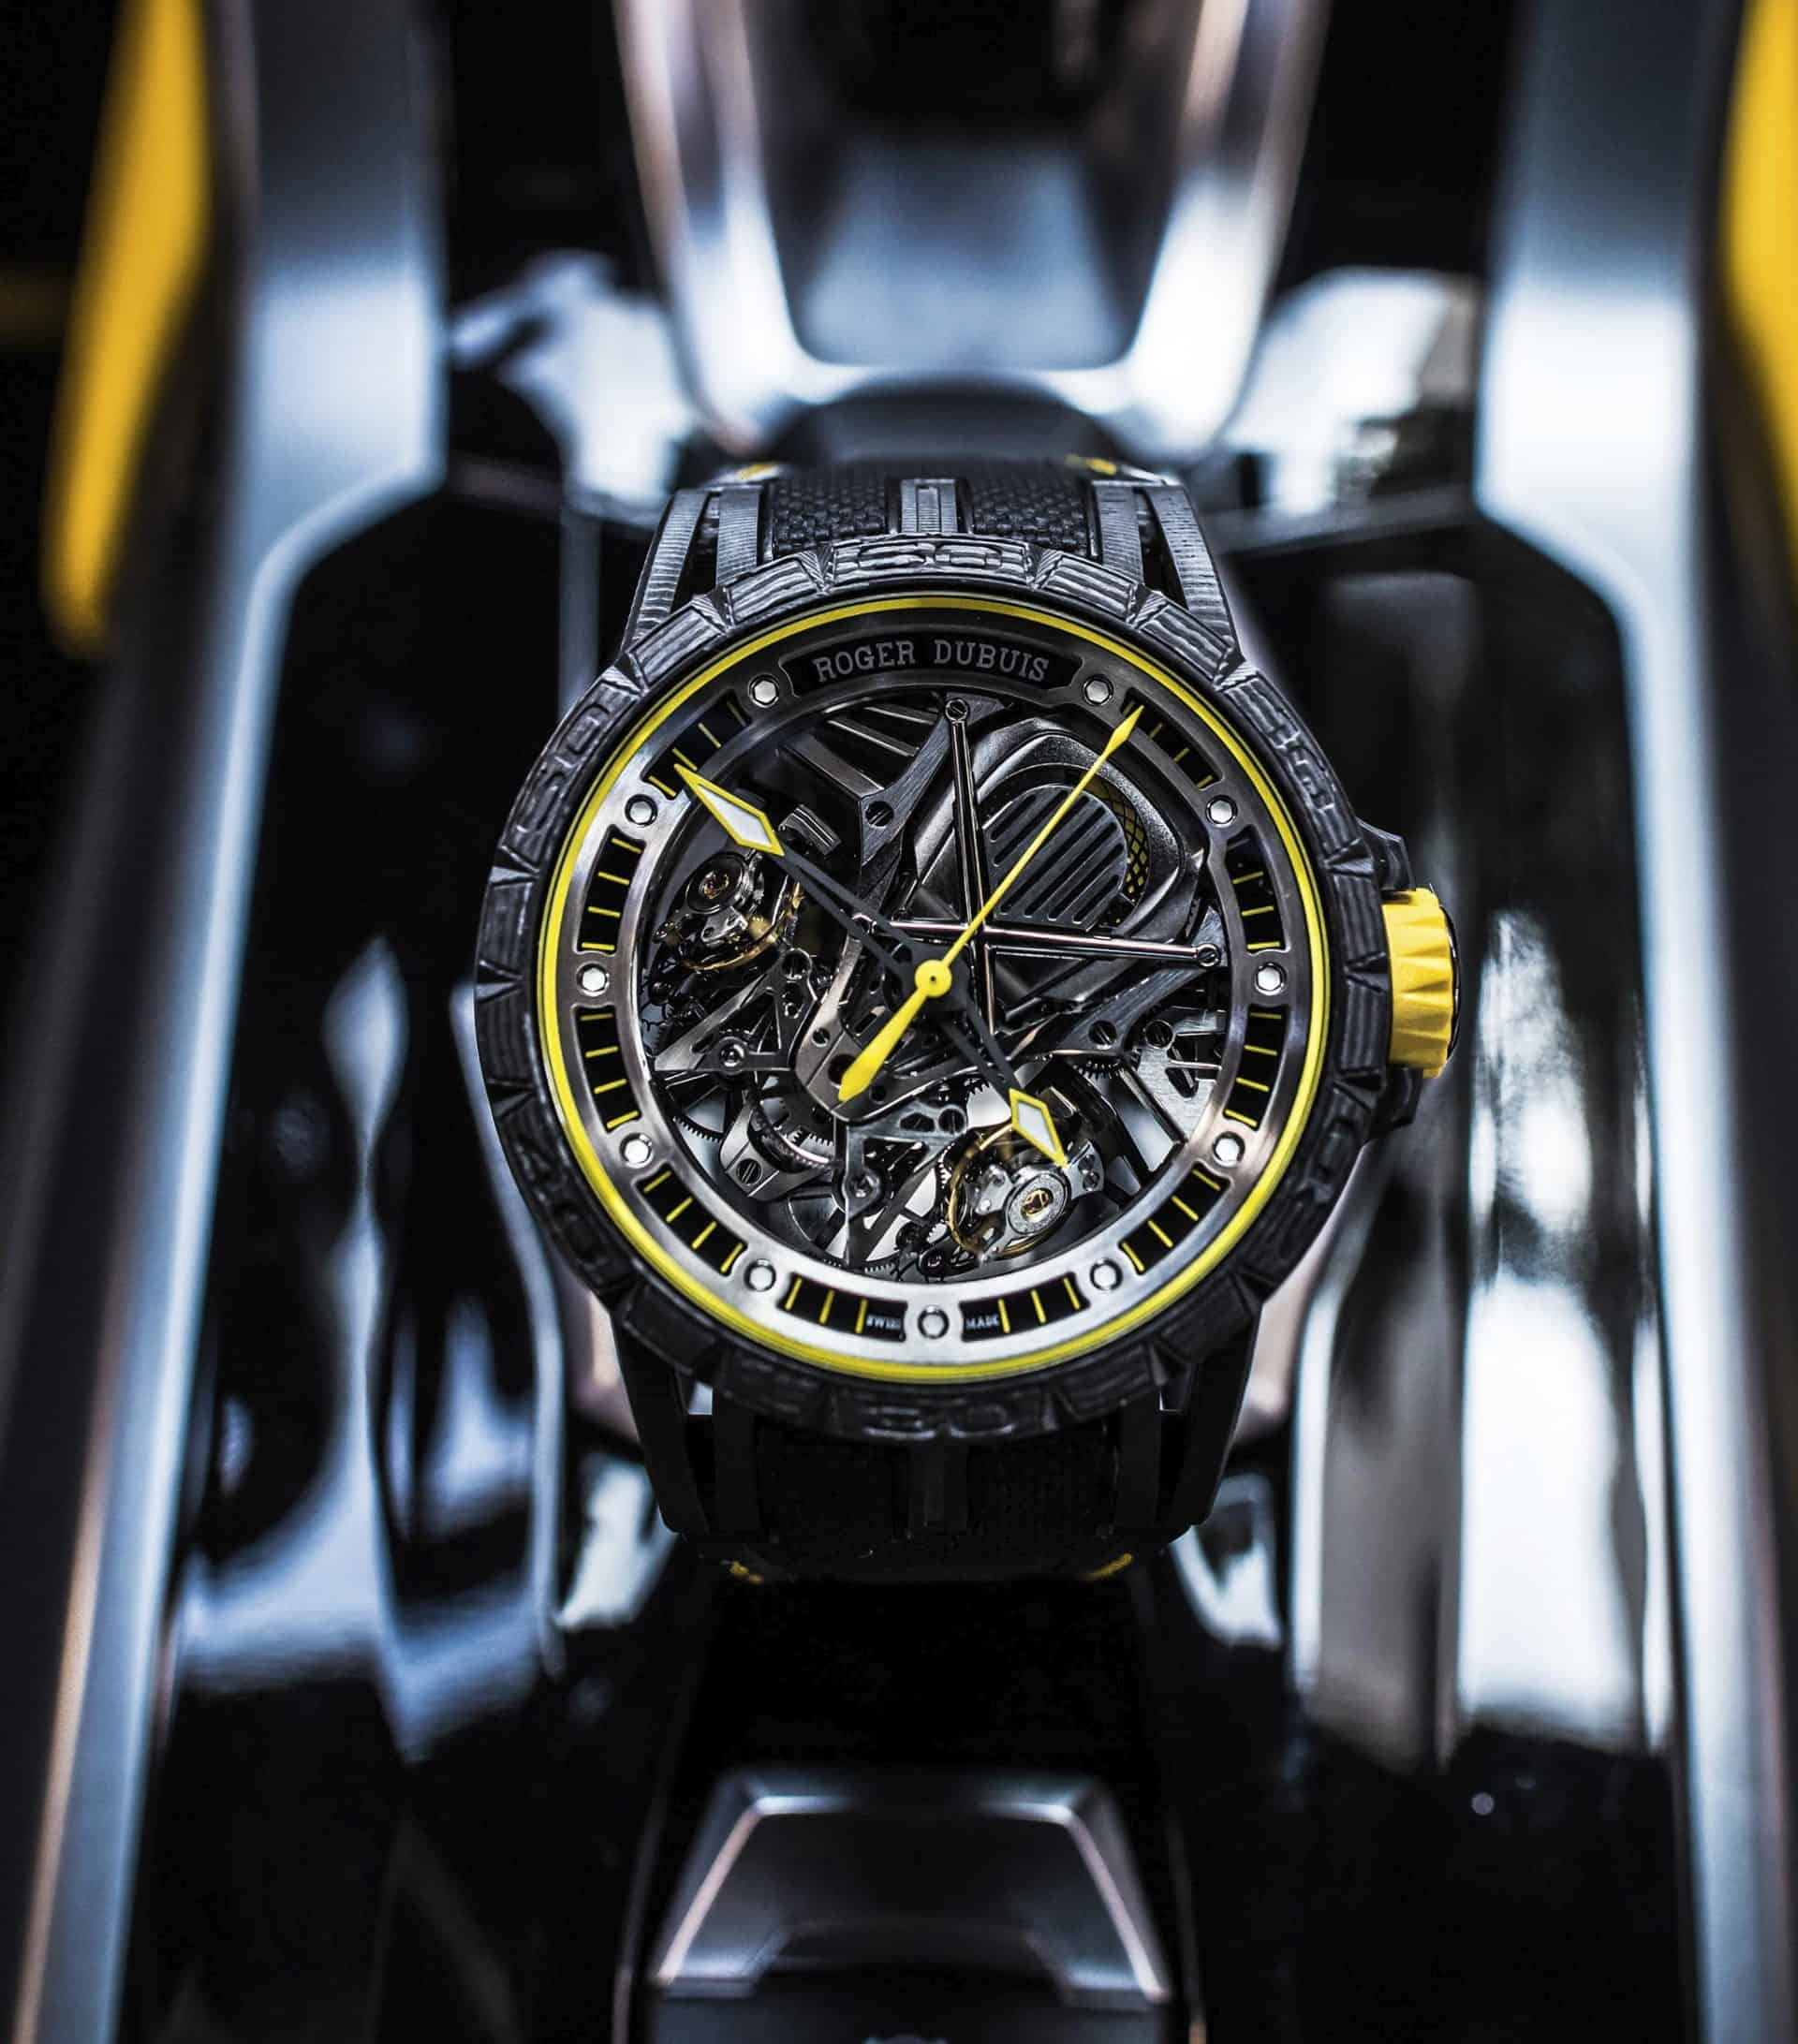 Entstand unter der Ägide von Jean-Marc Puntrue: Roger Dubuis Excalibur Aventador S